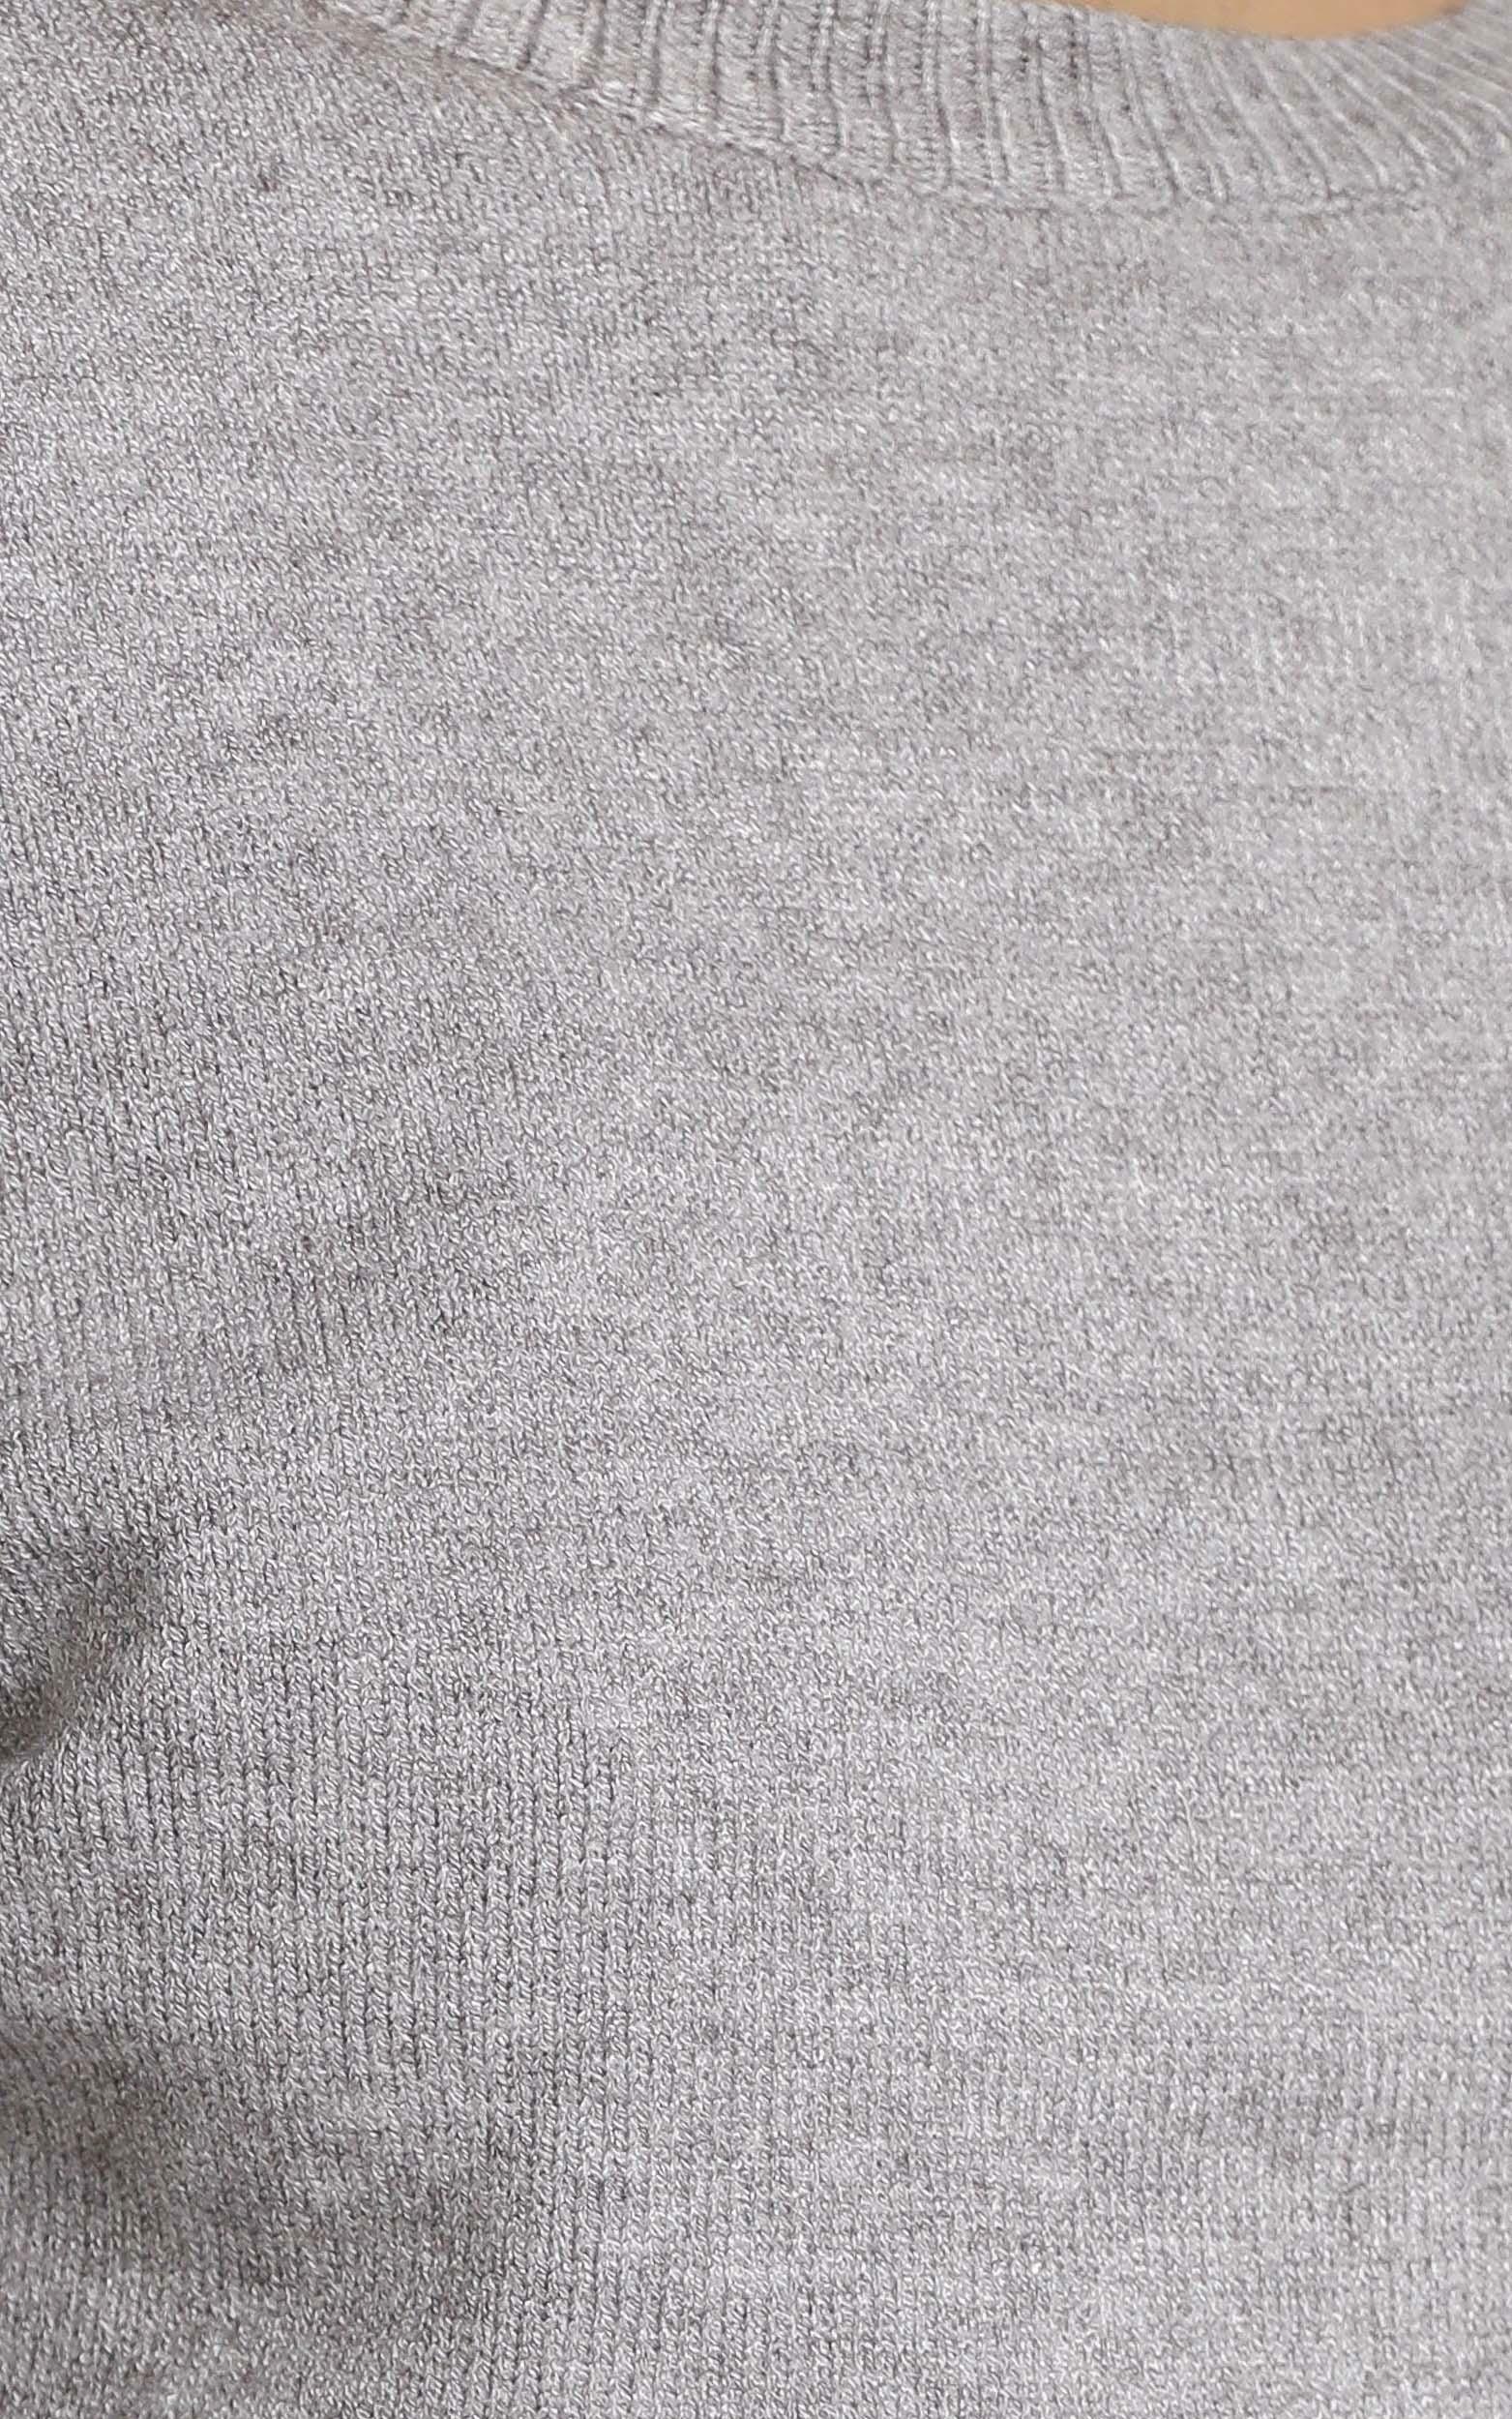 Arcadia Knit Top in Grey - 12 (L), Grey, hi-res image number null